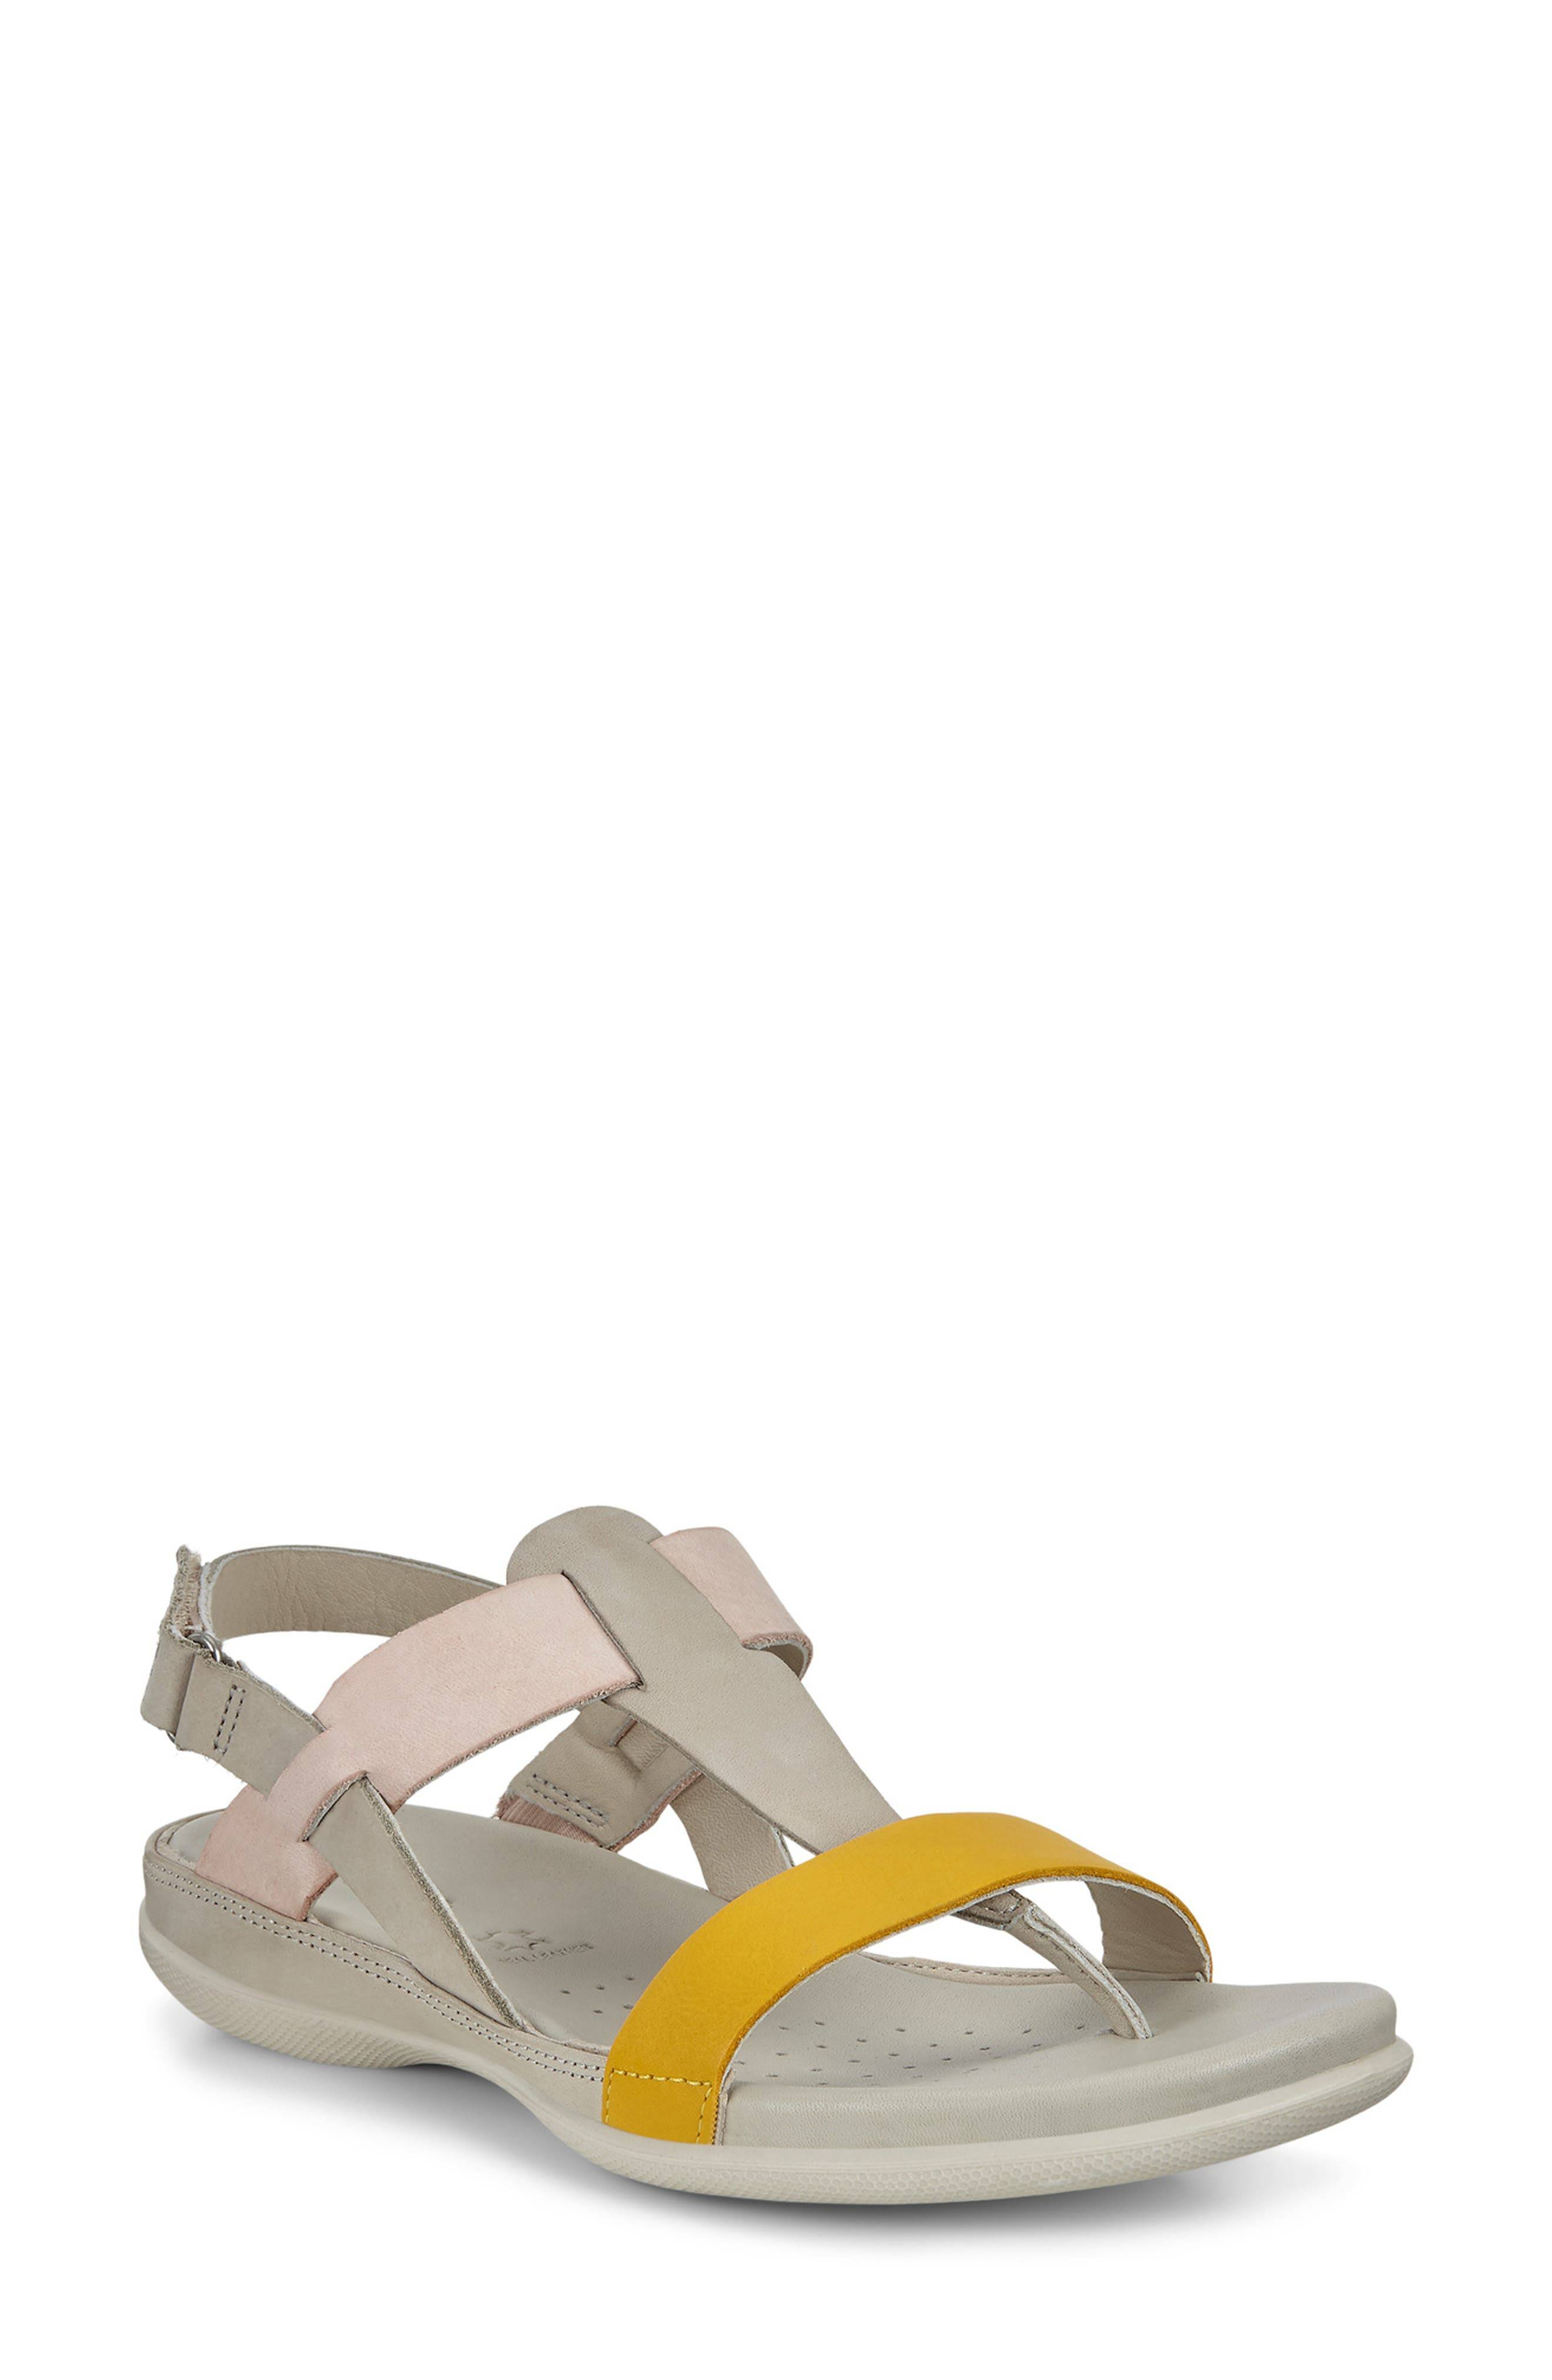 ECCO Women's Ecco Flash Toe Post Sandal, Size 7-7.5US - Grey